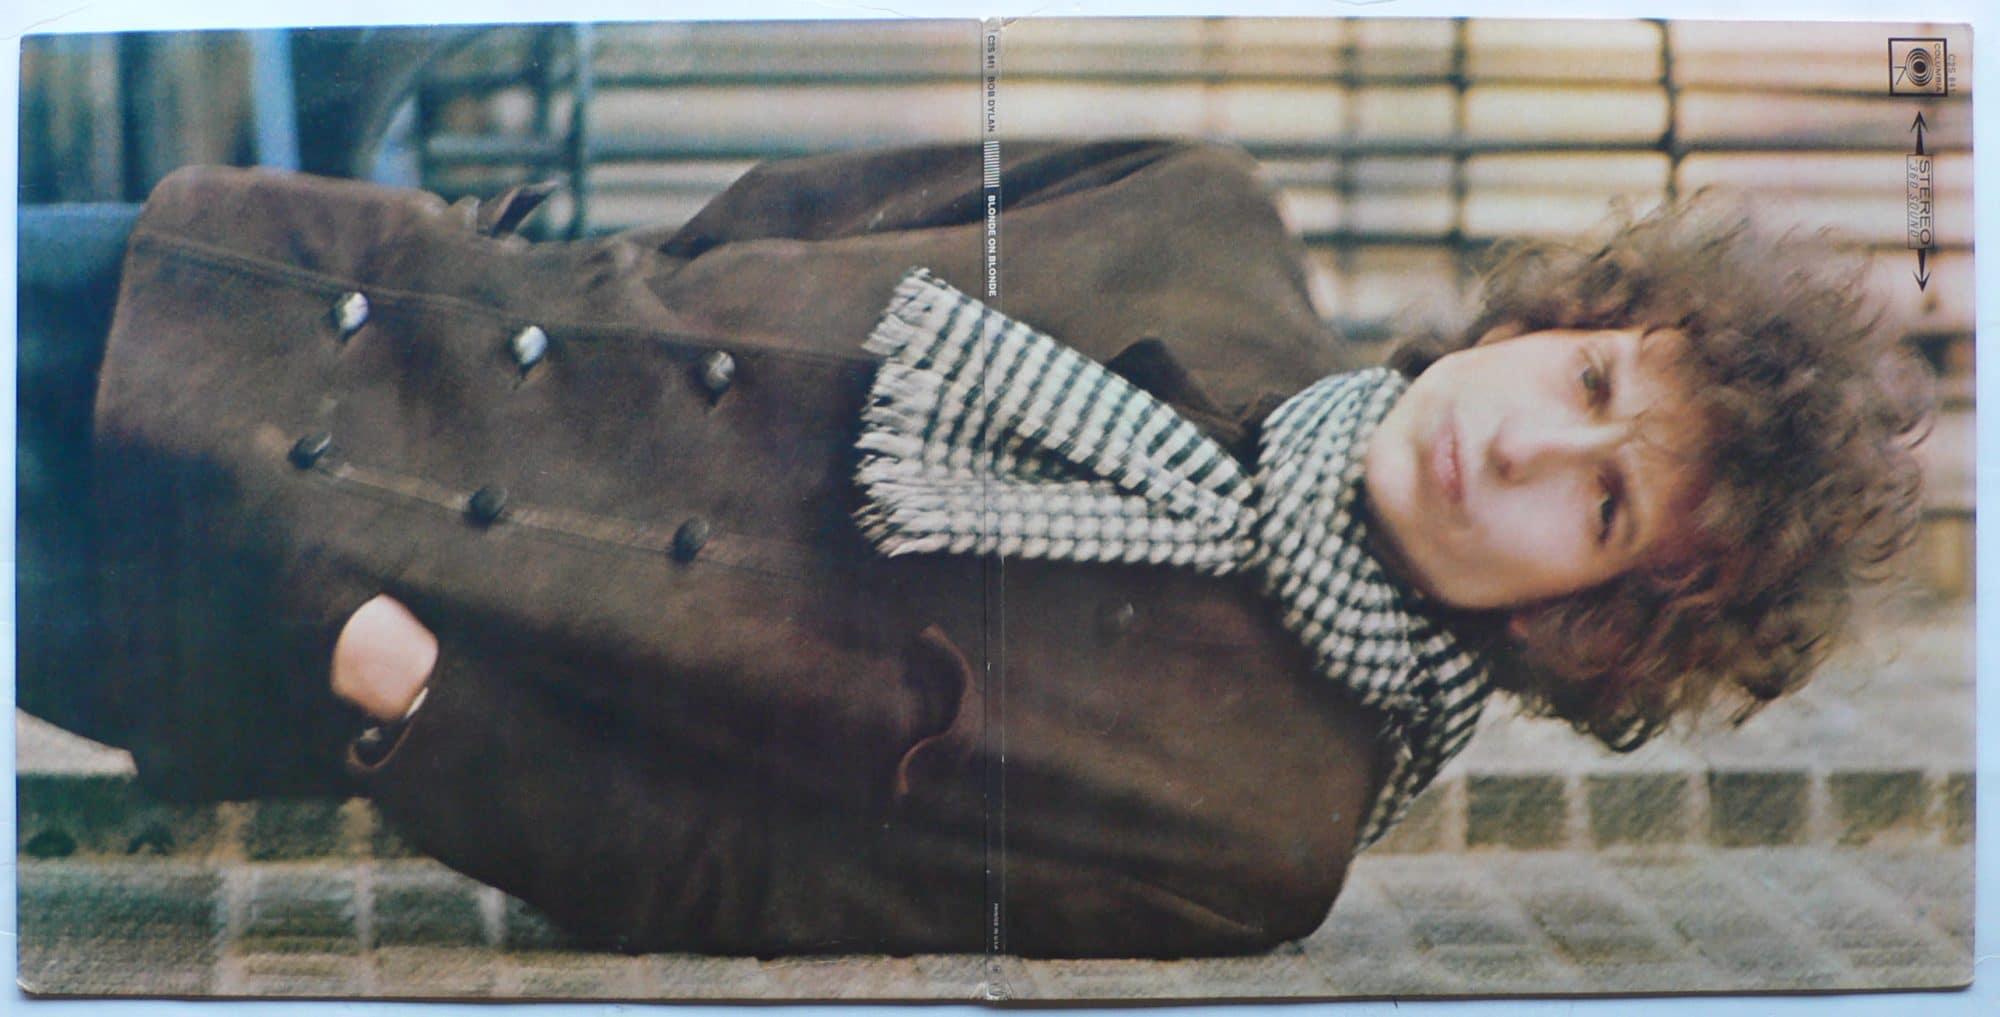 Bob Dylan Near Mint First Pressing Blonde